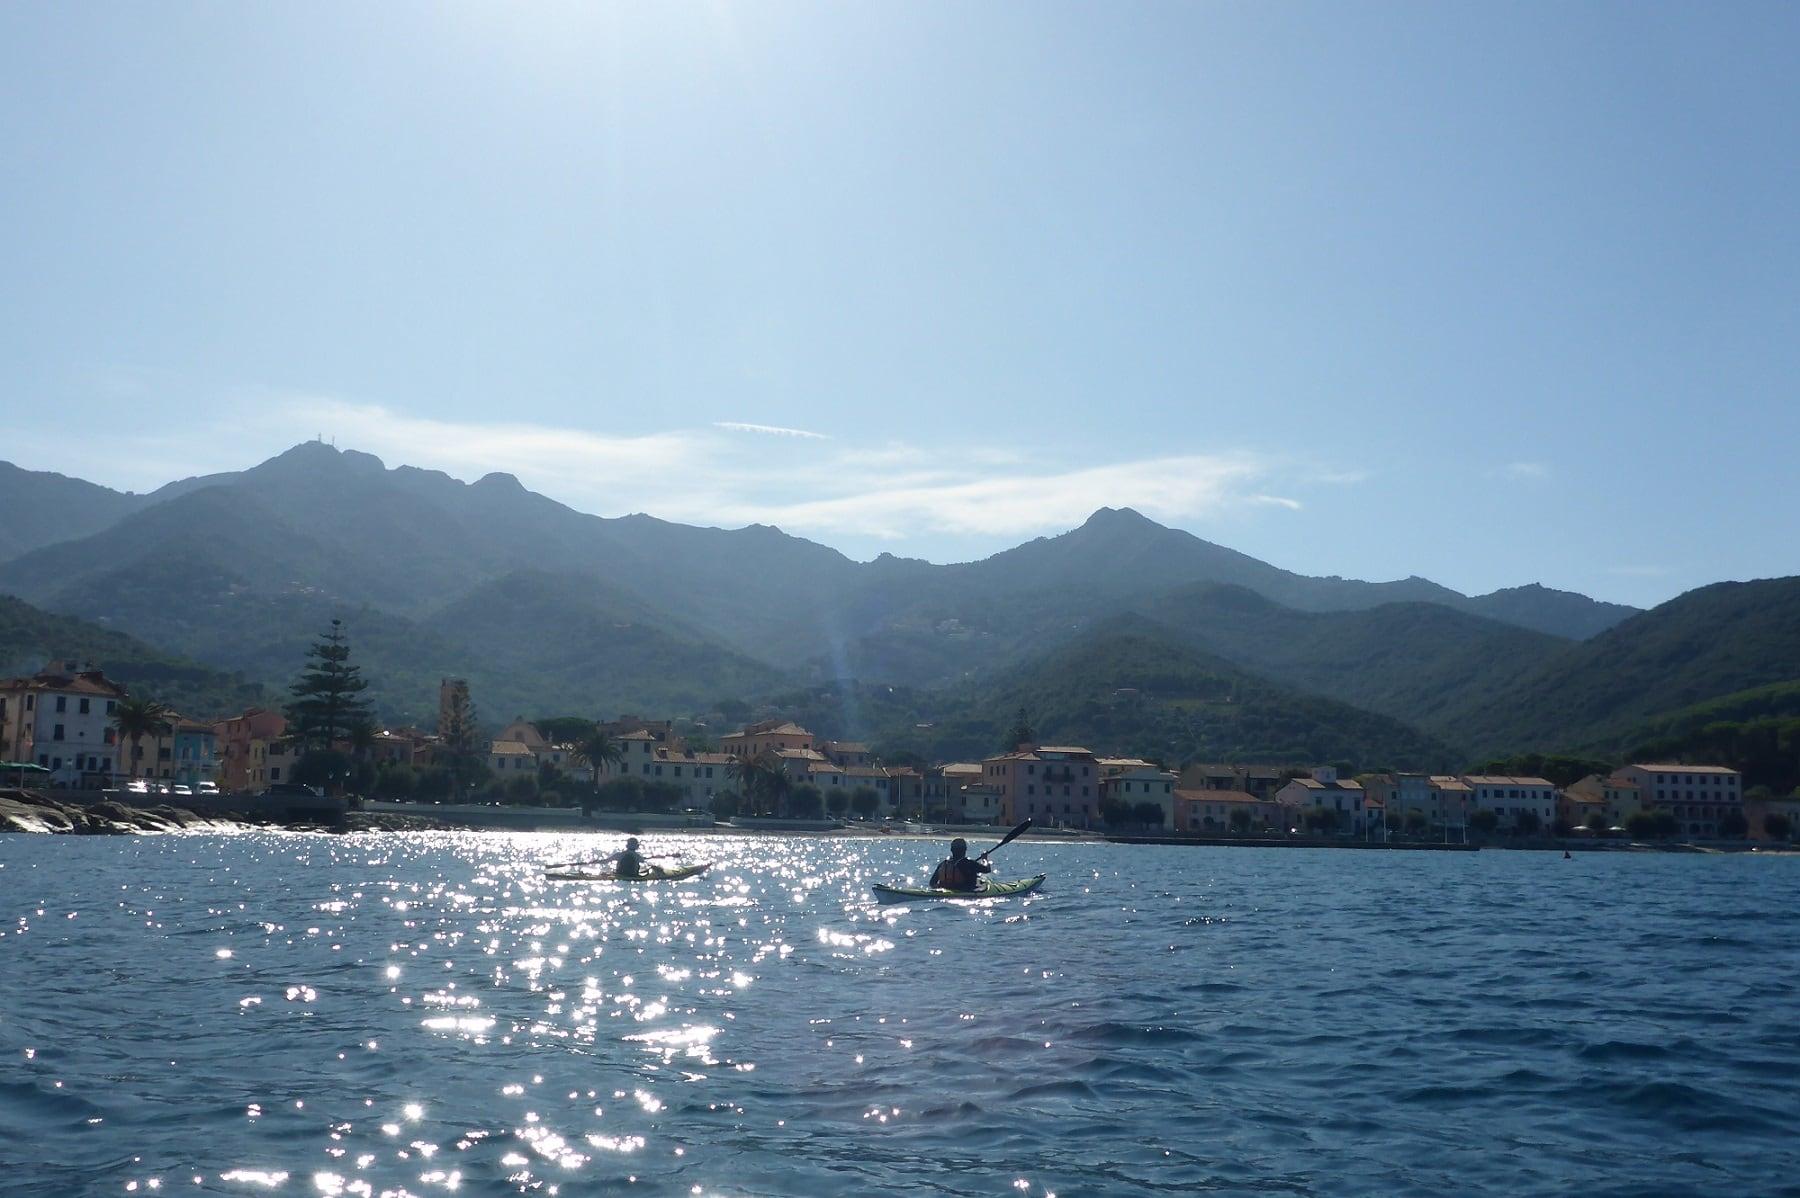 Ankunft in Marciana Marina das Ende der Inselumrundung